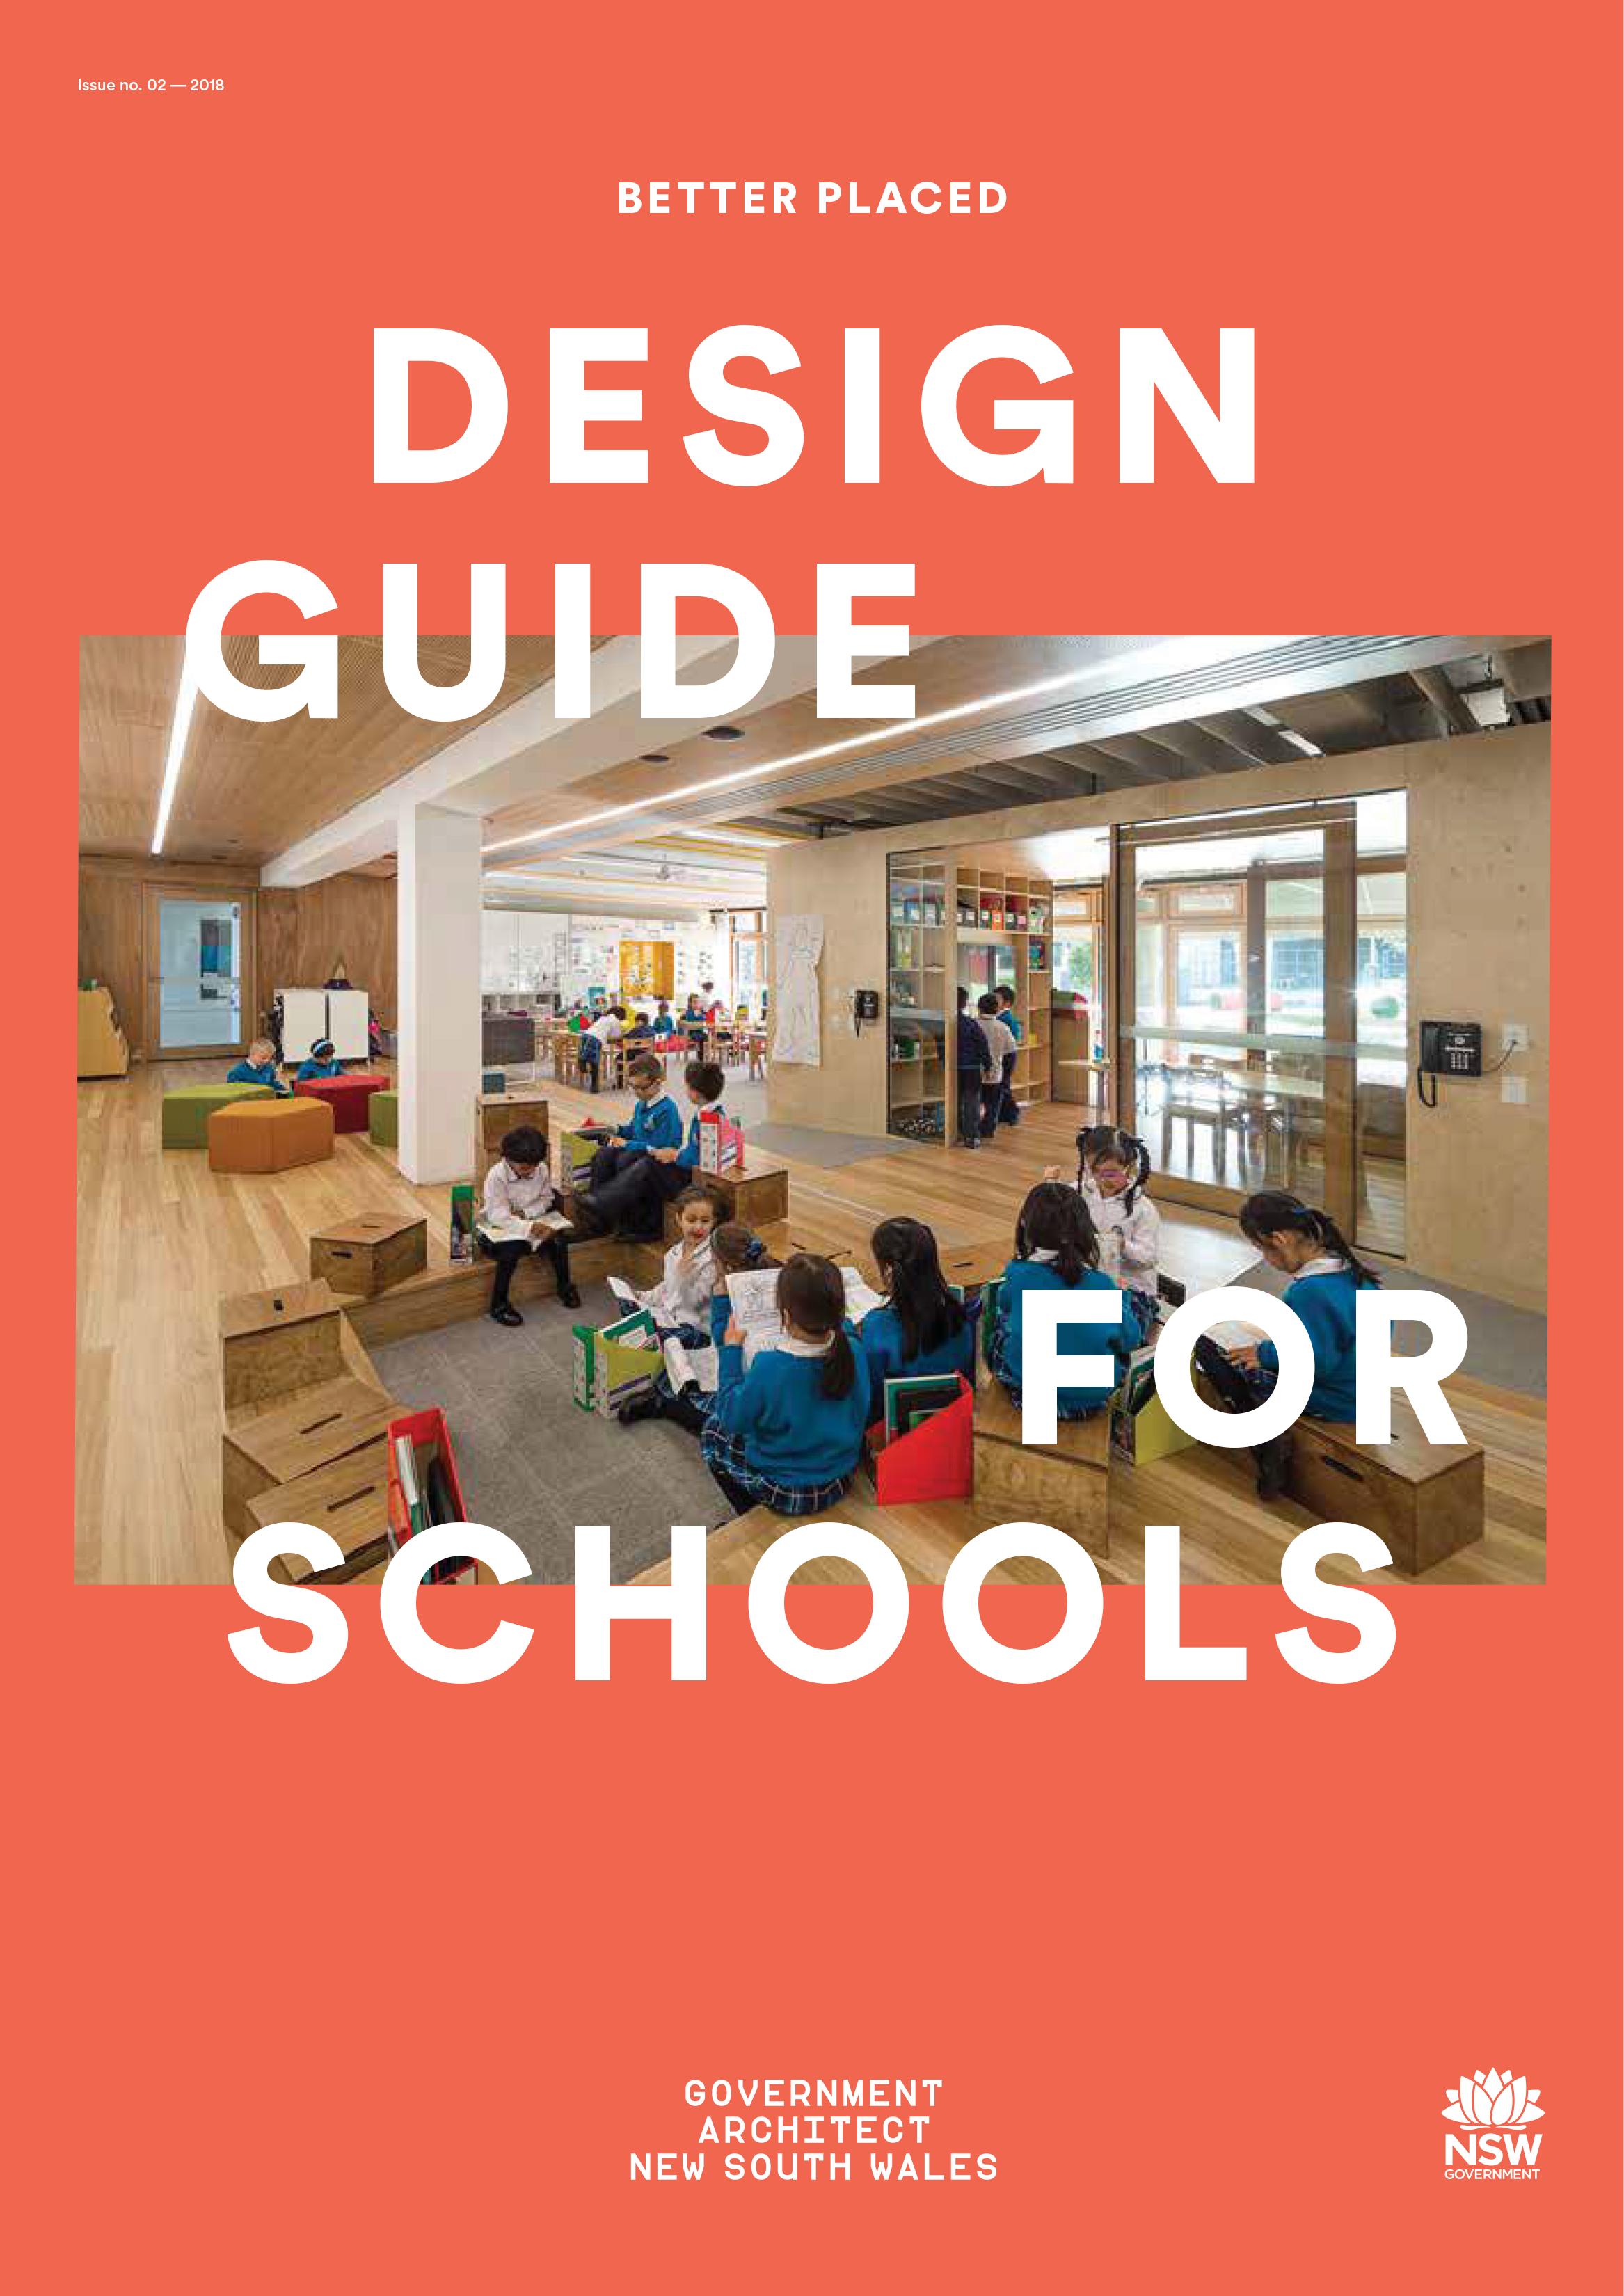 design guide for schools 2018 05 14 (1).jpg